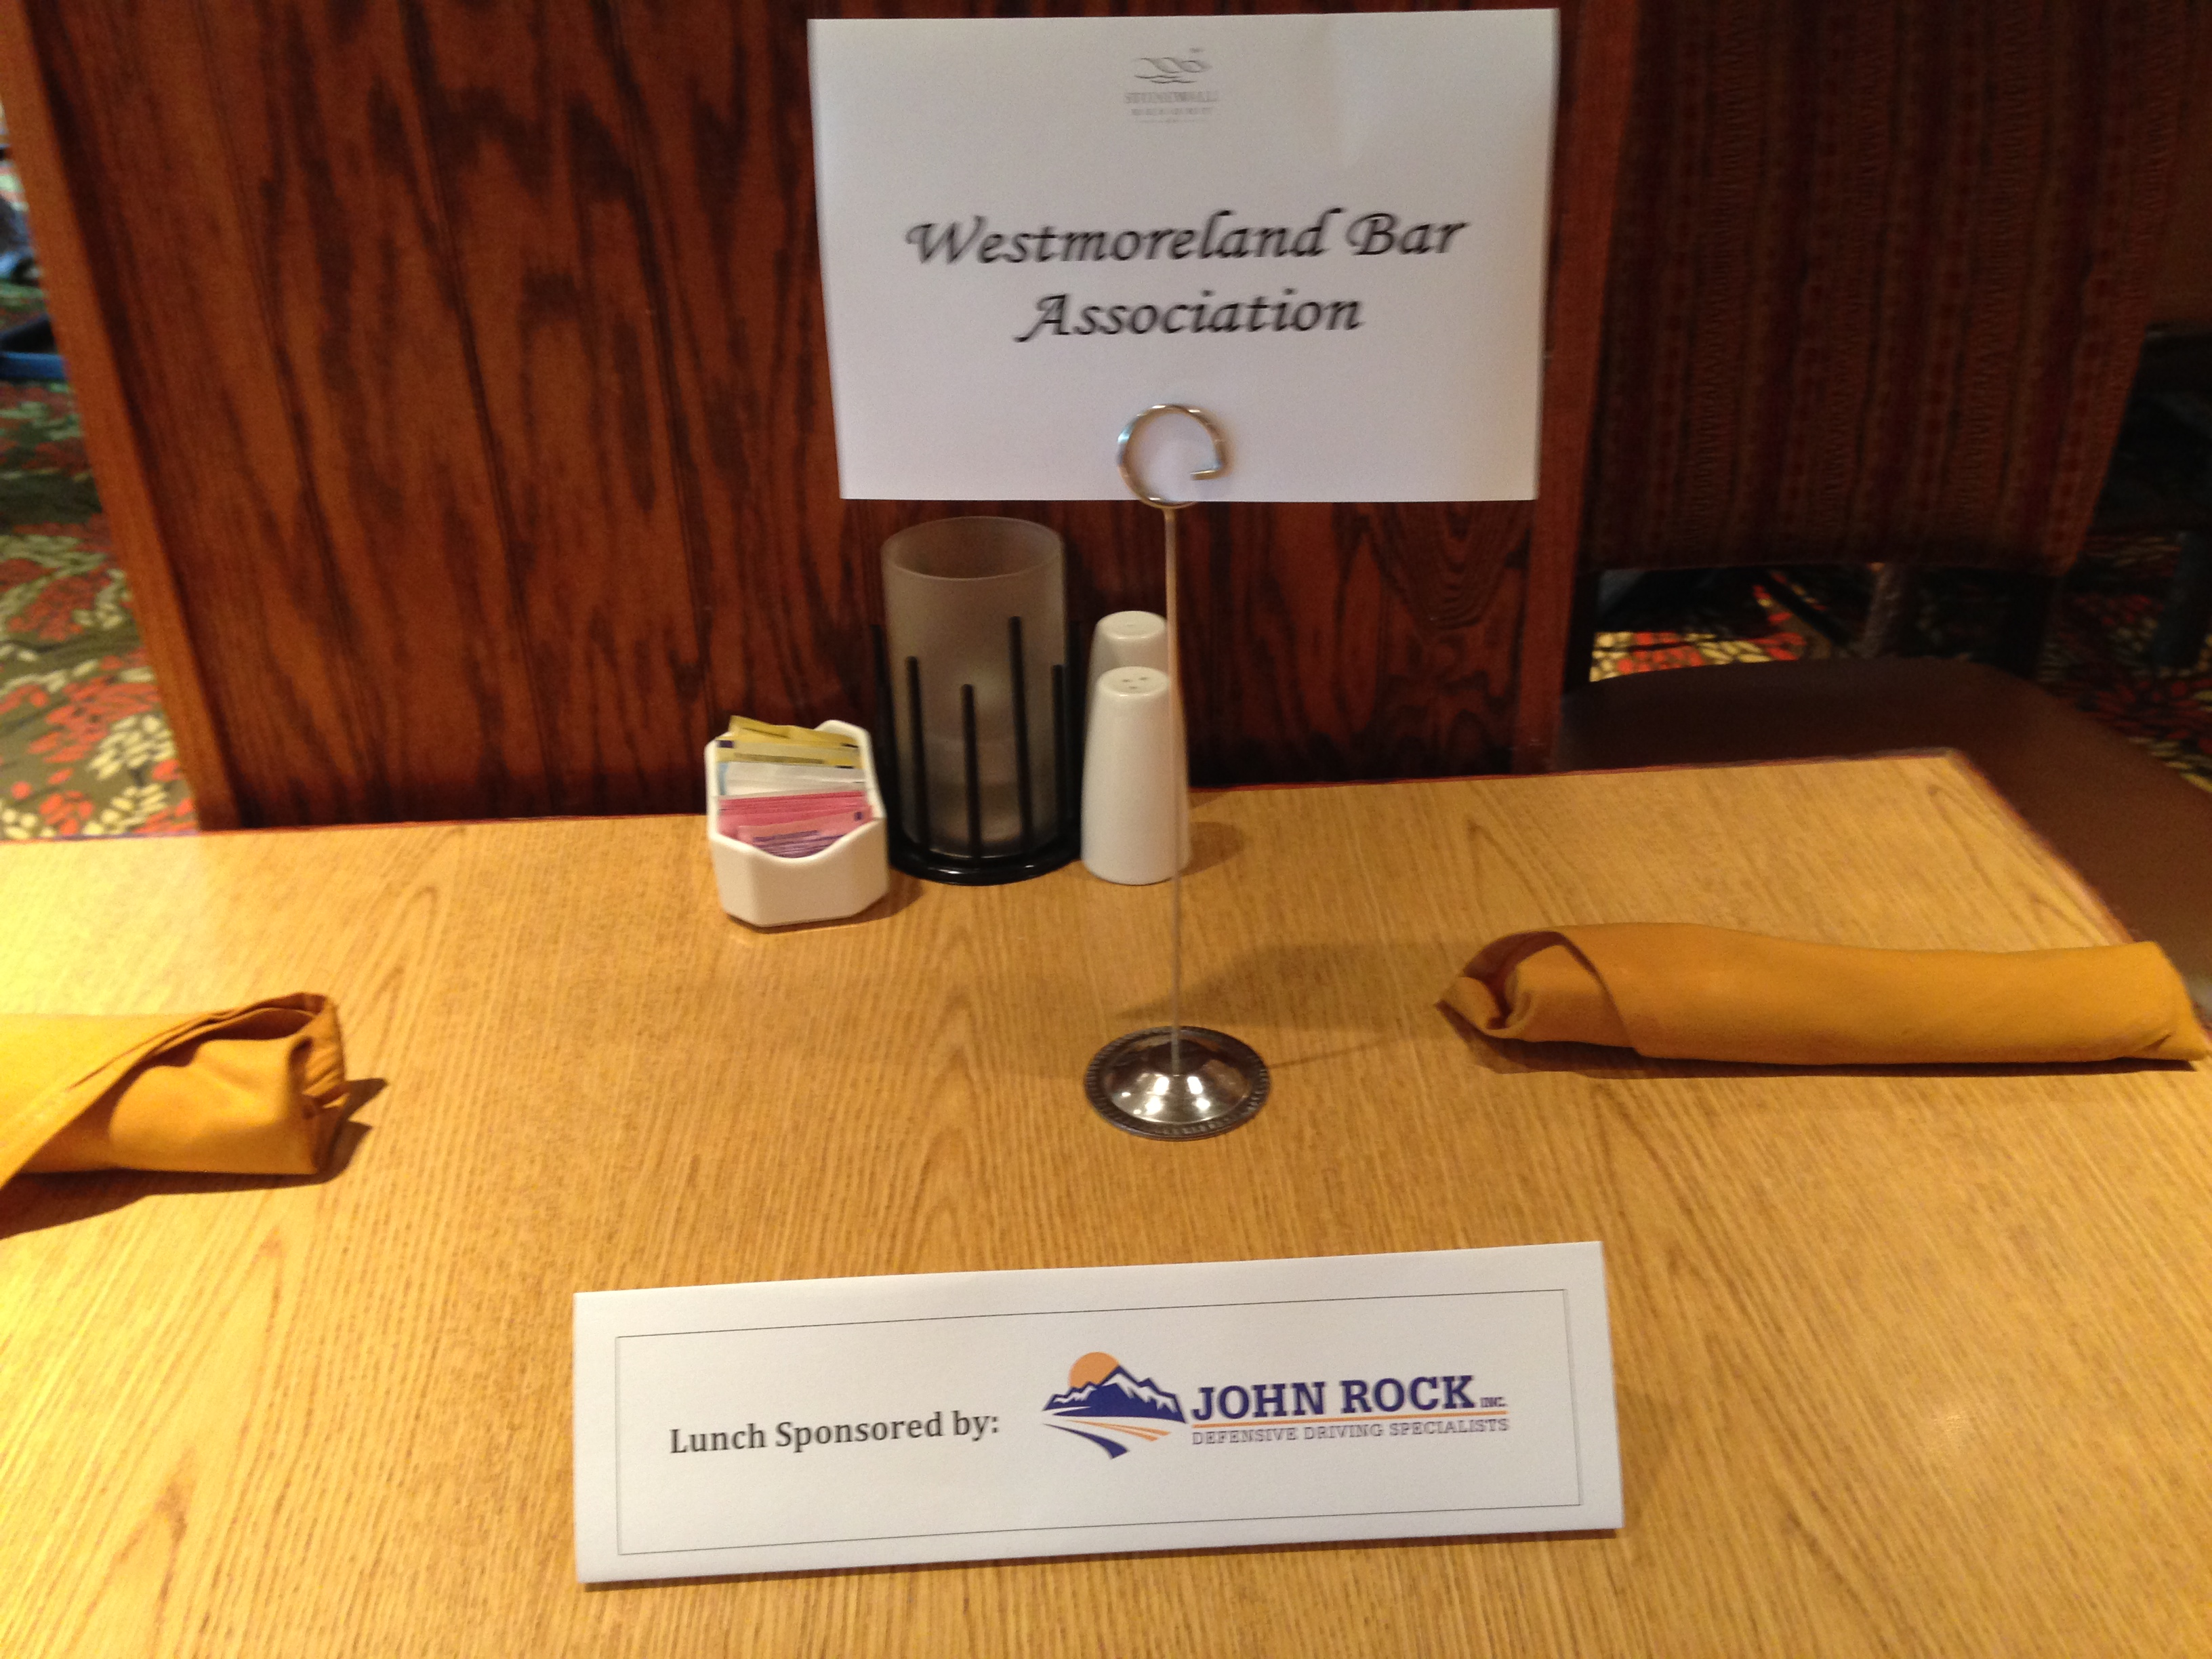 Westmoreland Bar Association